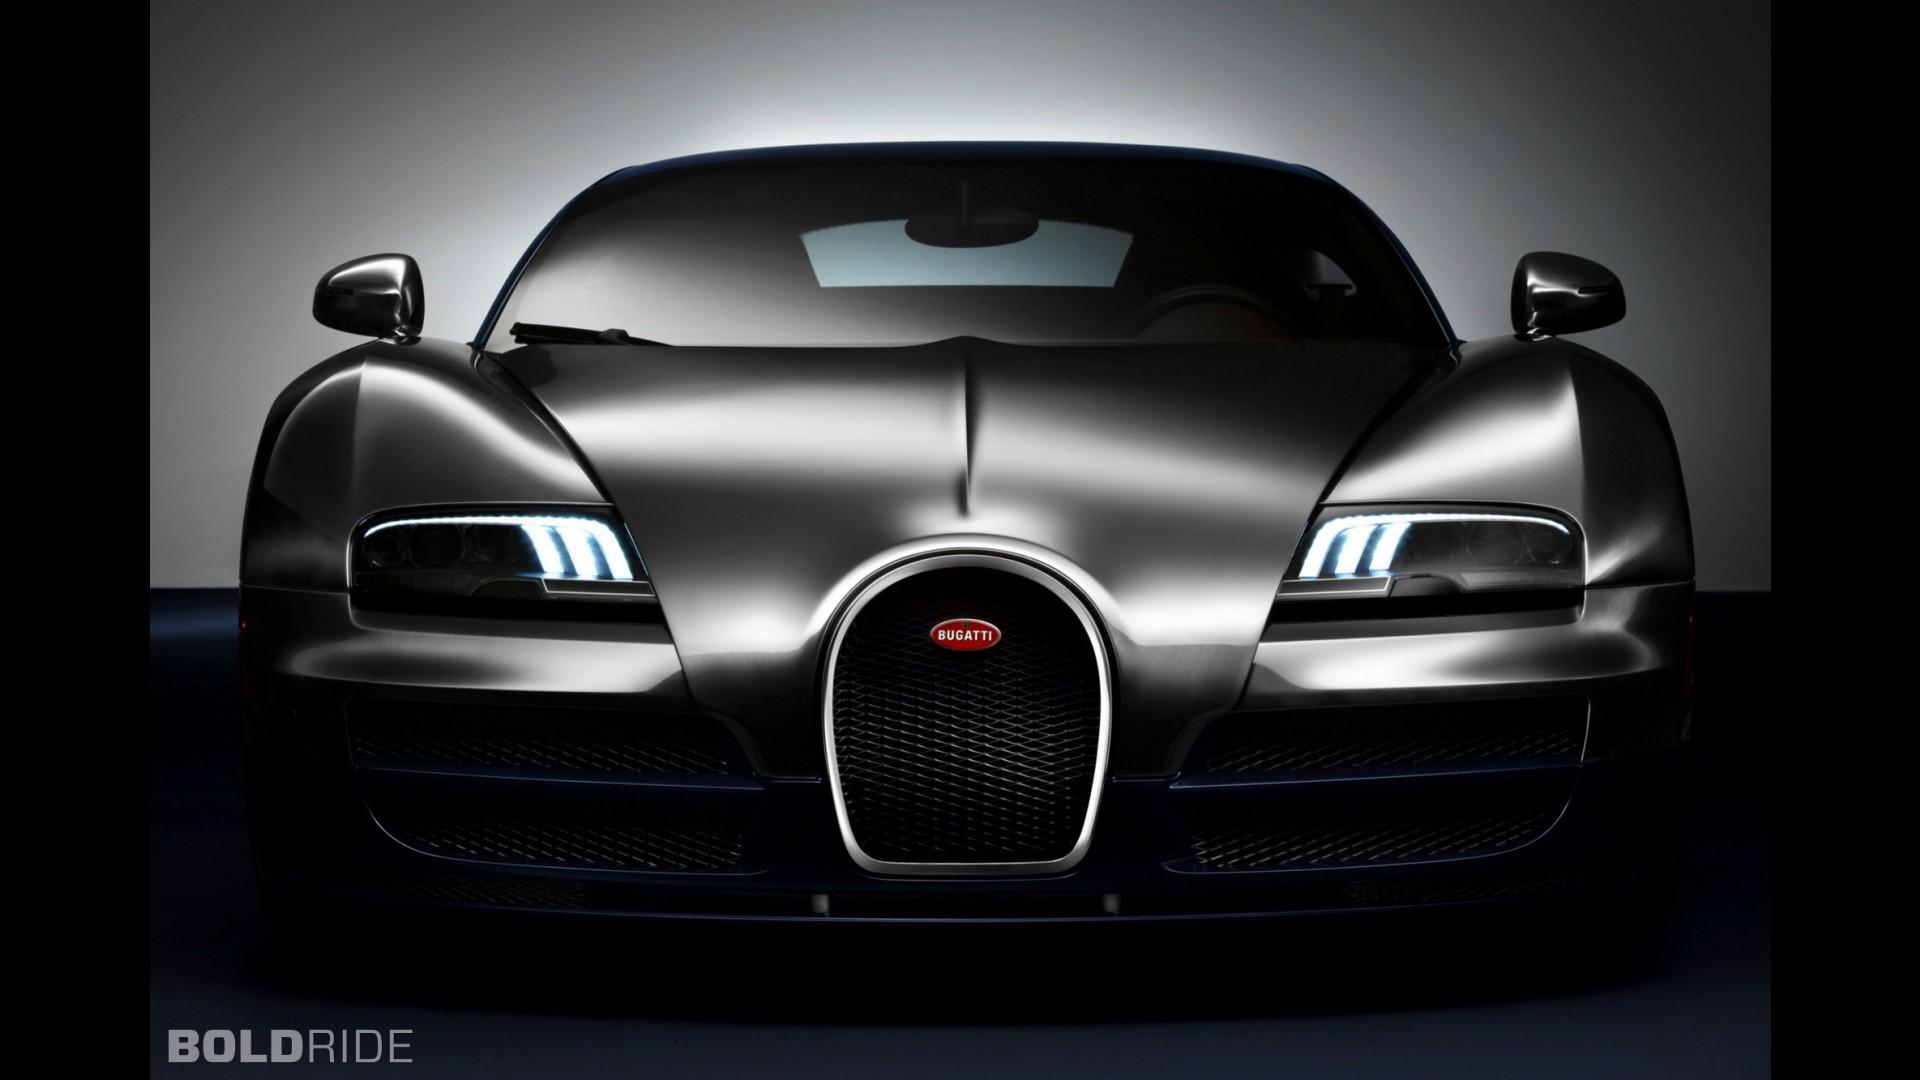 bugatti-veyron-grand-sport-vitesse-legend-ettore-bugatti Gorgeous Bugatti Veyron Zero to 60 Cars Trend